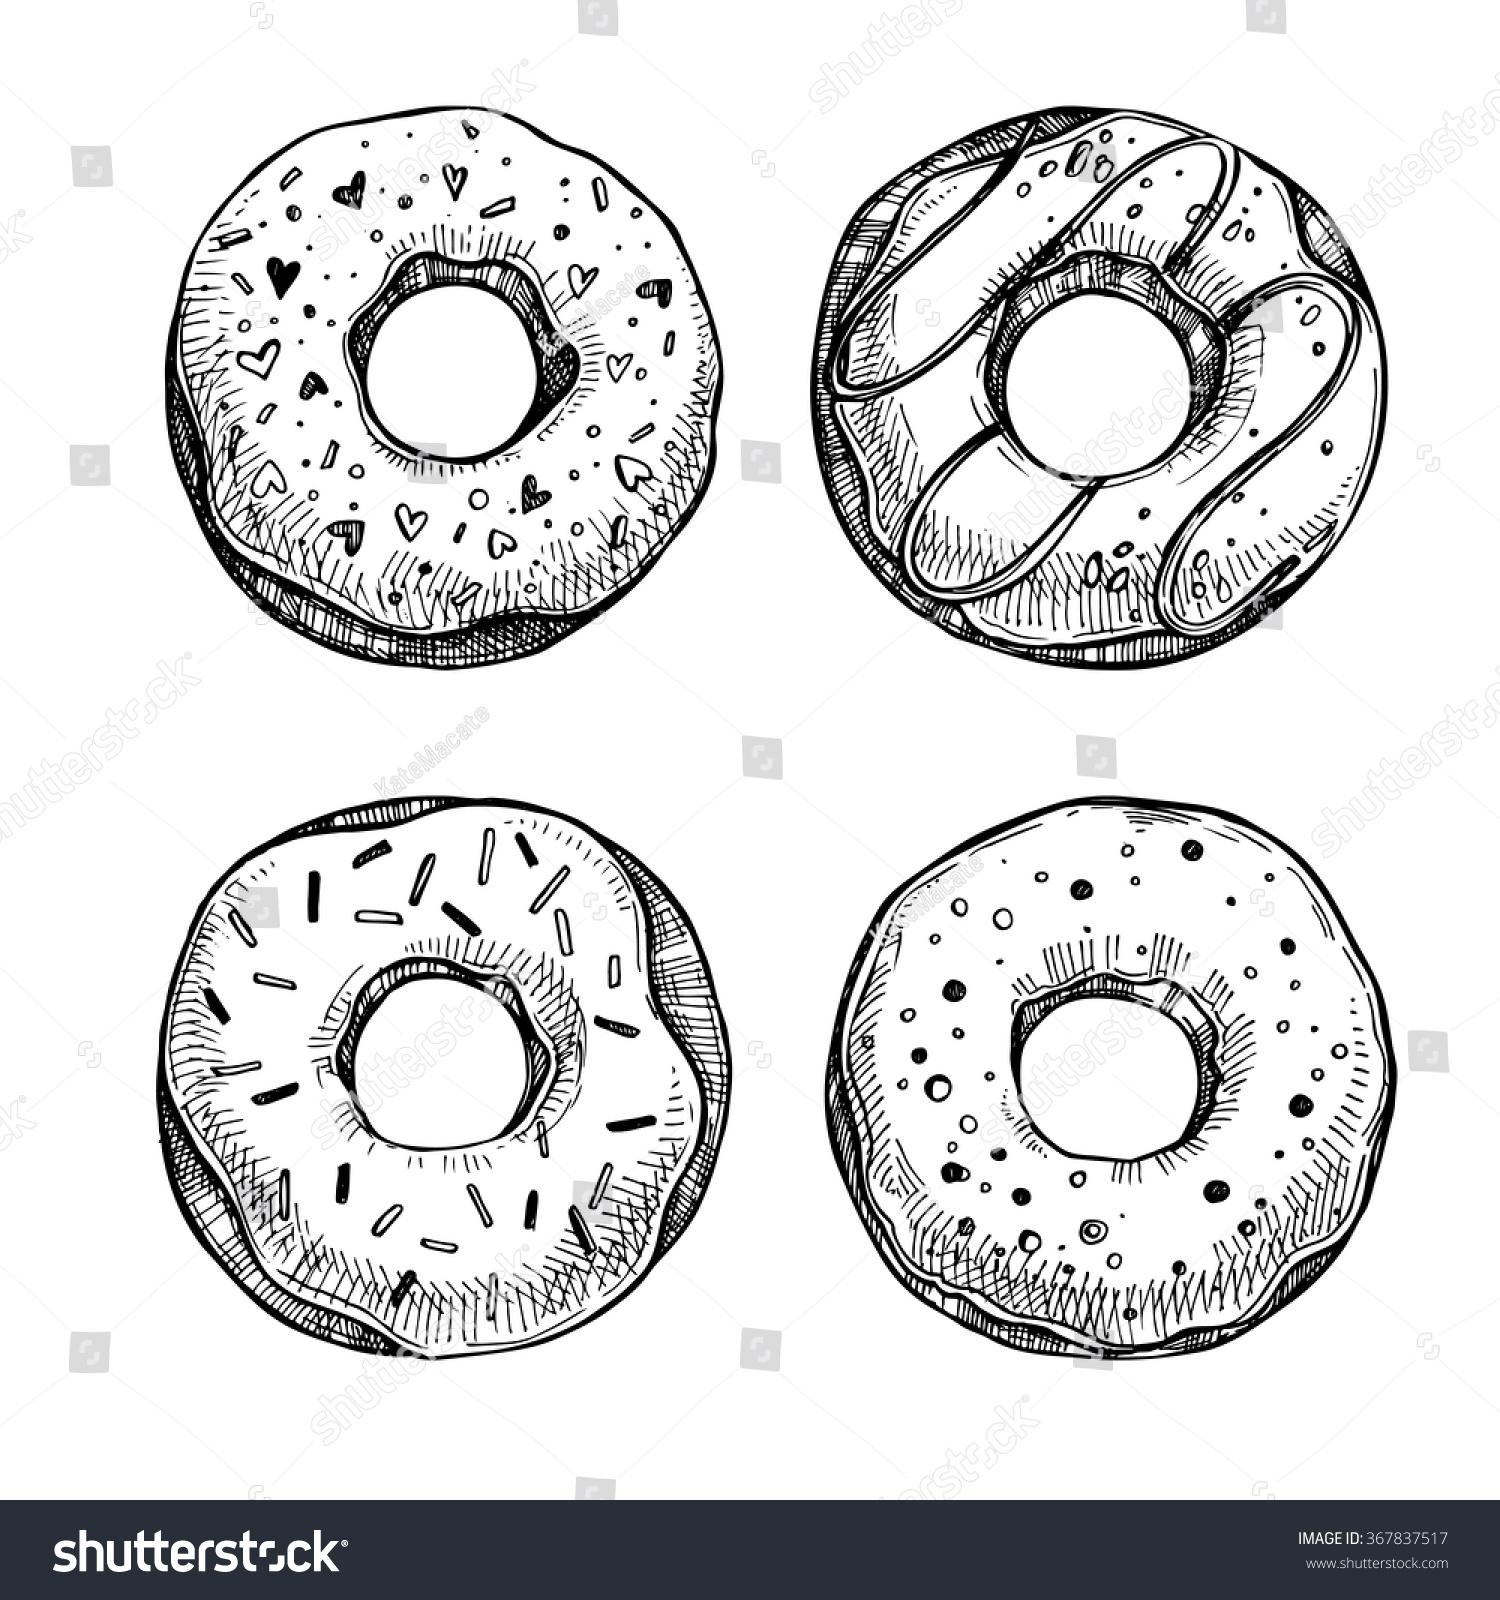 Hand Drawn Vector Illustration - Set Of Tasty Donuts ...